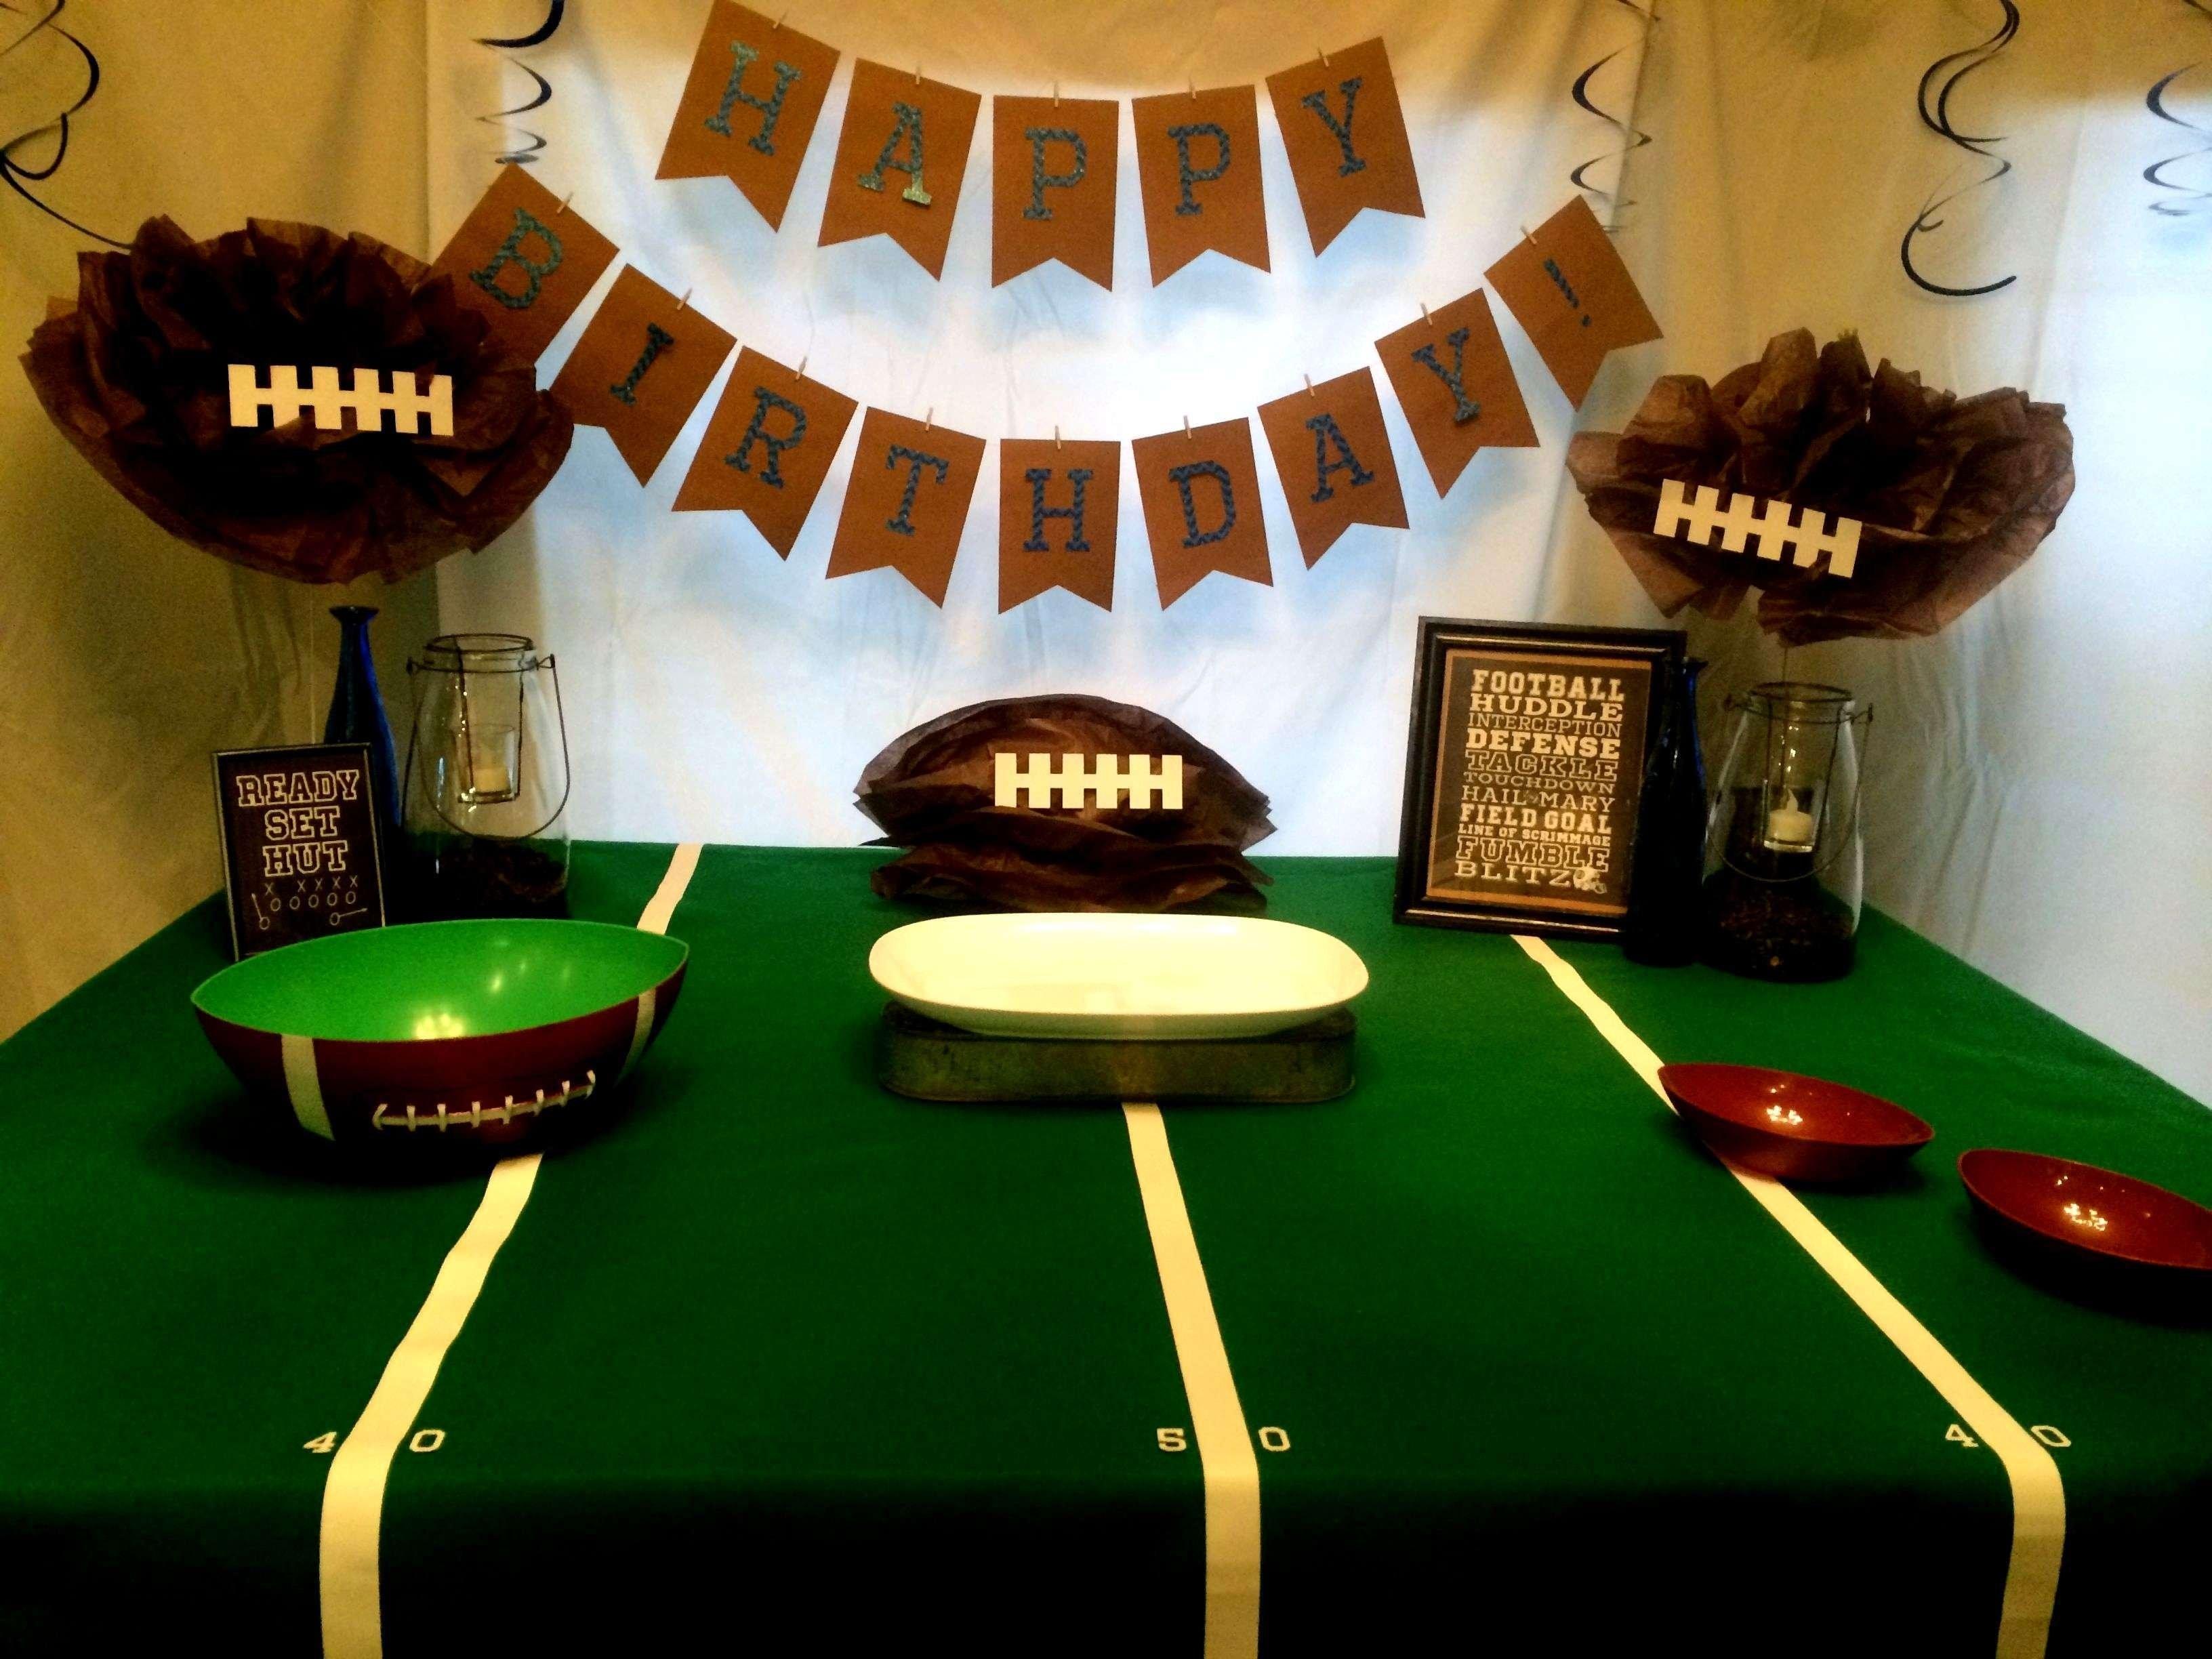 10 Amazing Super Bowl Party Decorating Ideas super bowl party decorations lovely decorations for super bowl party 2020